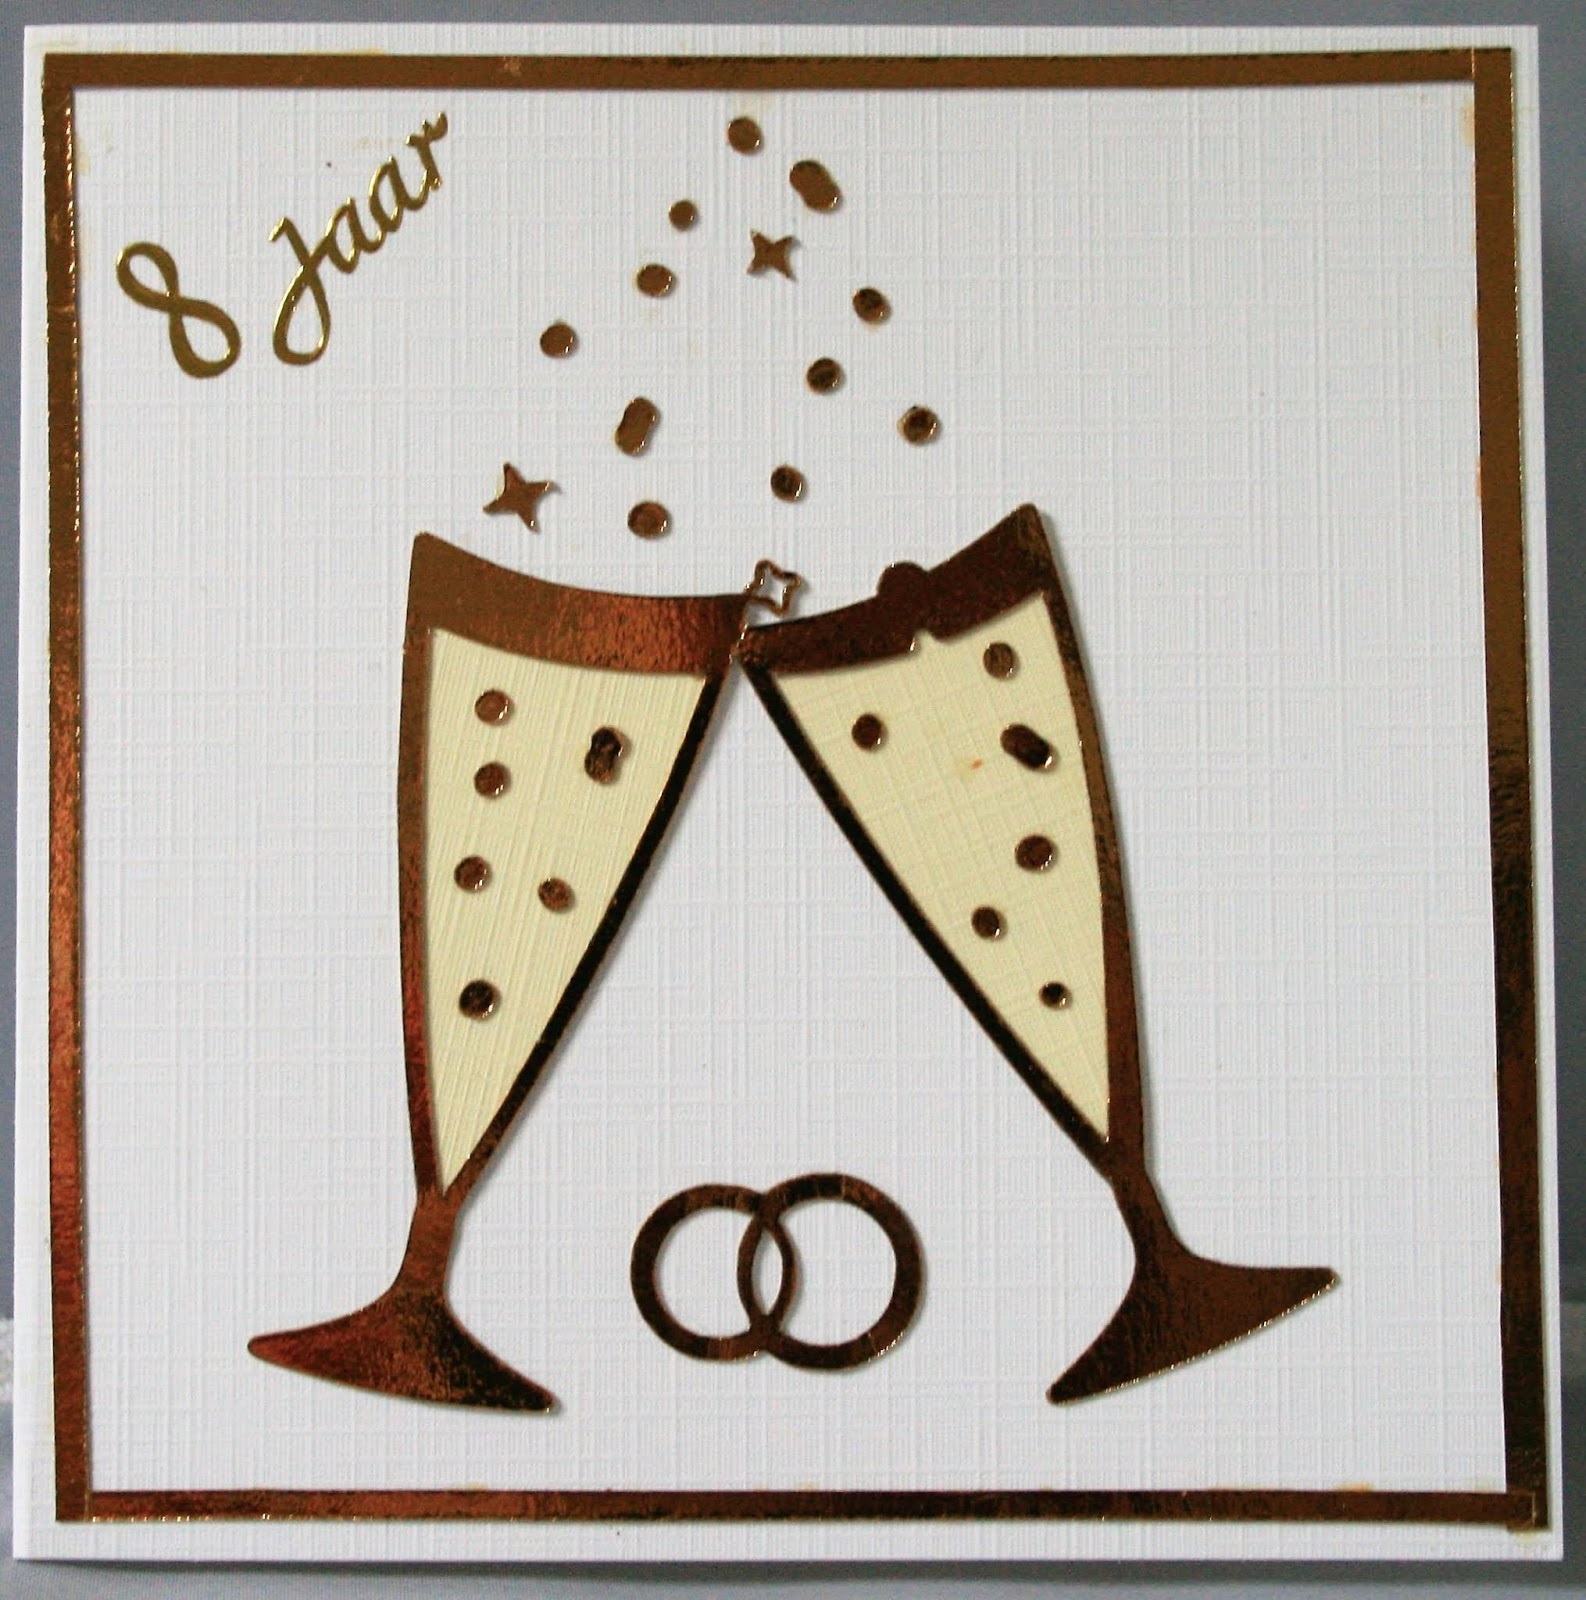 8 jaar getrouwd cadeau 8 Jaar Getrouwd   ARCHIDEV 8 jaar getrouwd cadeau